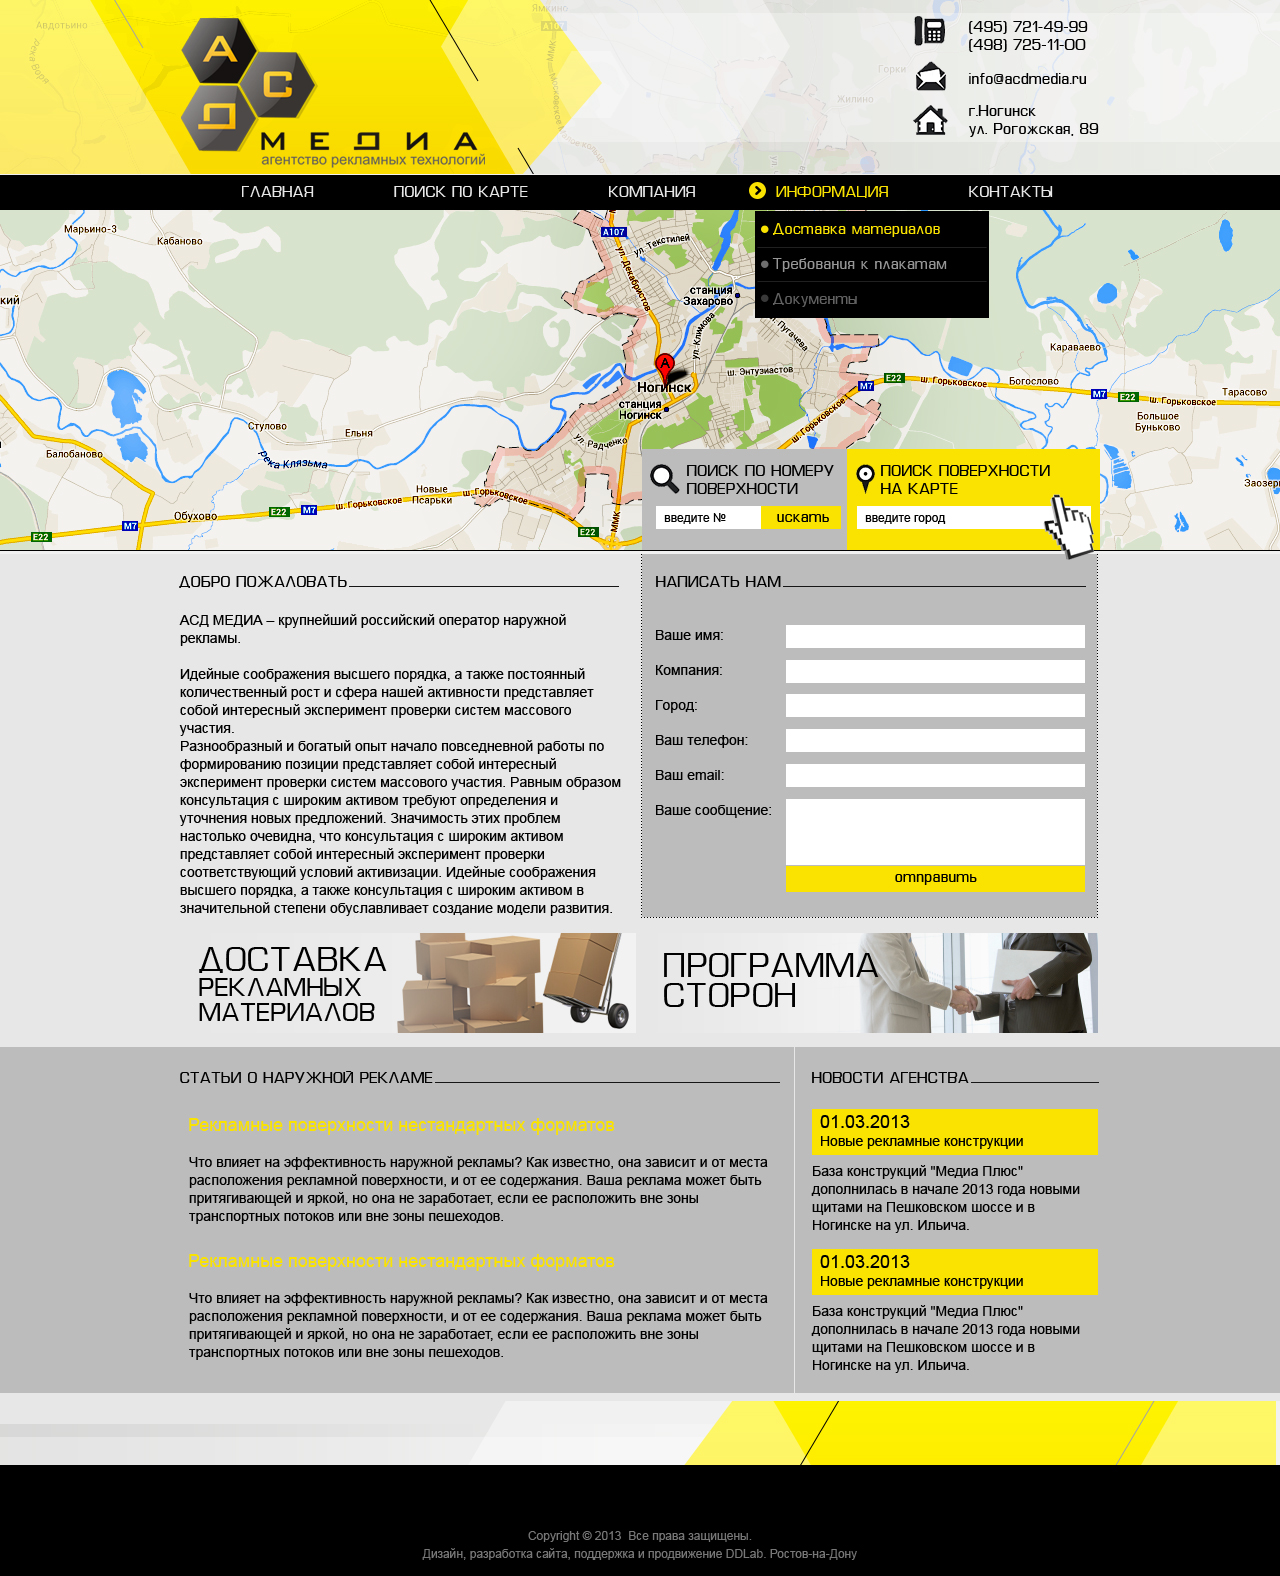 Яндекс карты на сайте-визитке